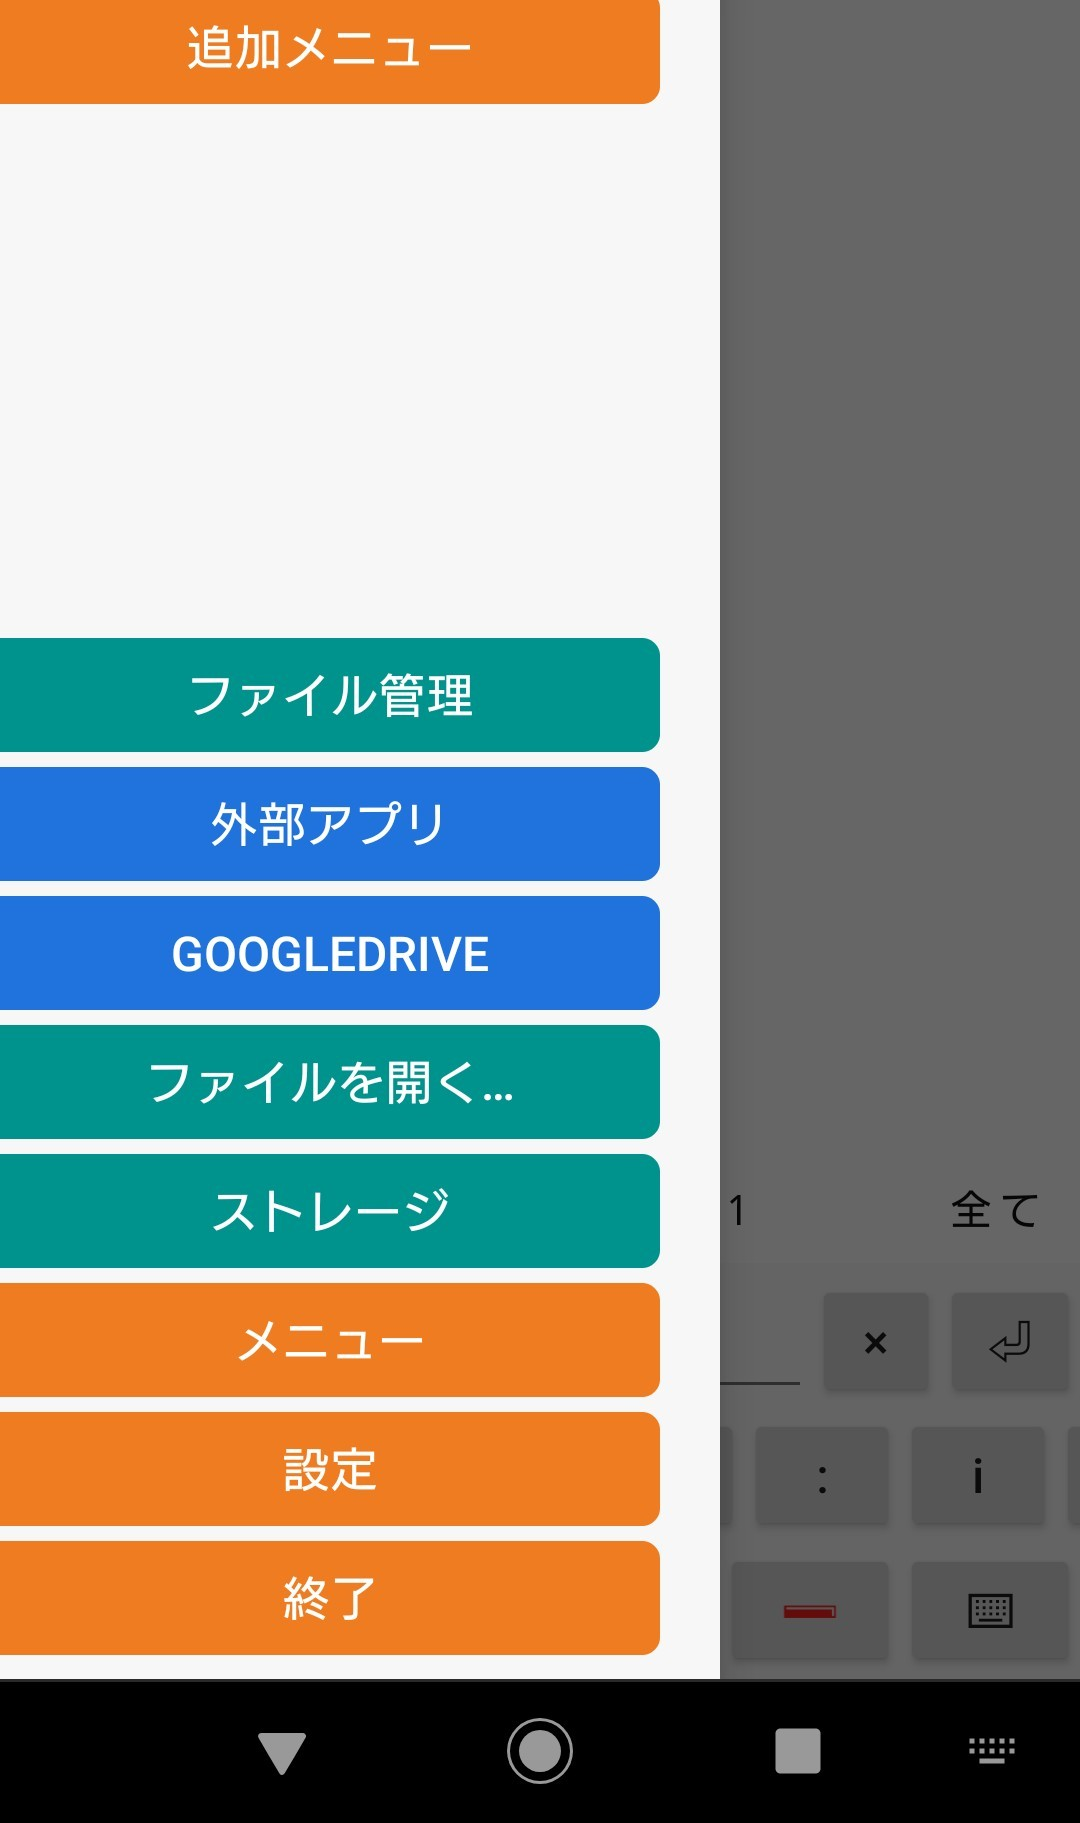 f:id:chayarokurokuro:20210302191328j:plain